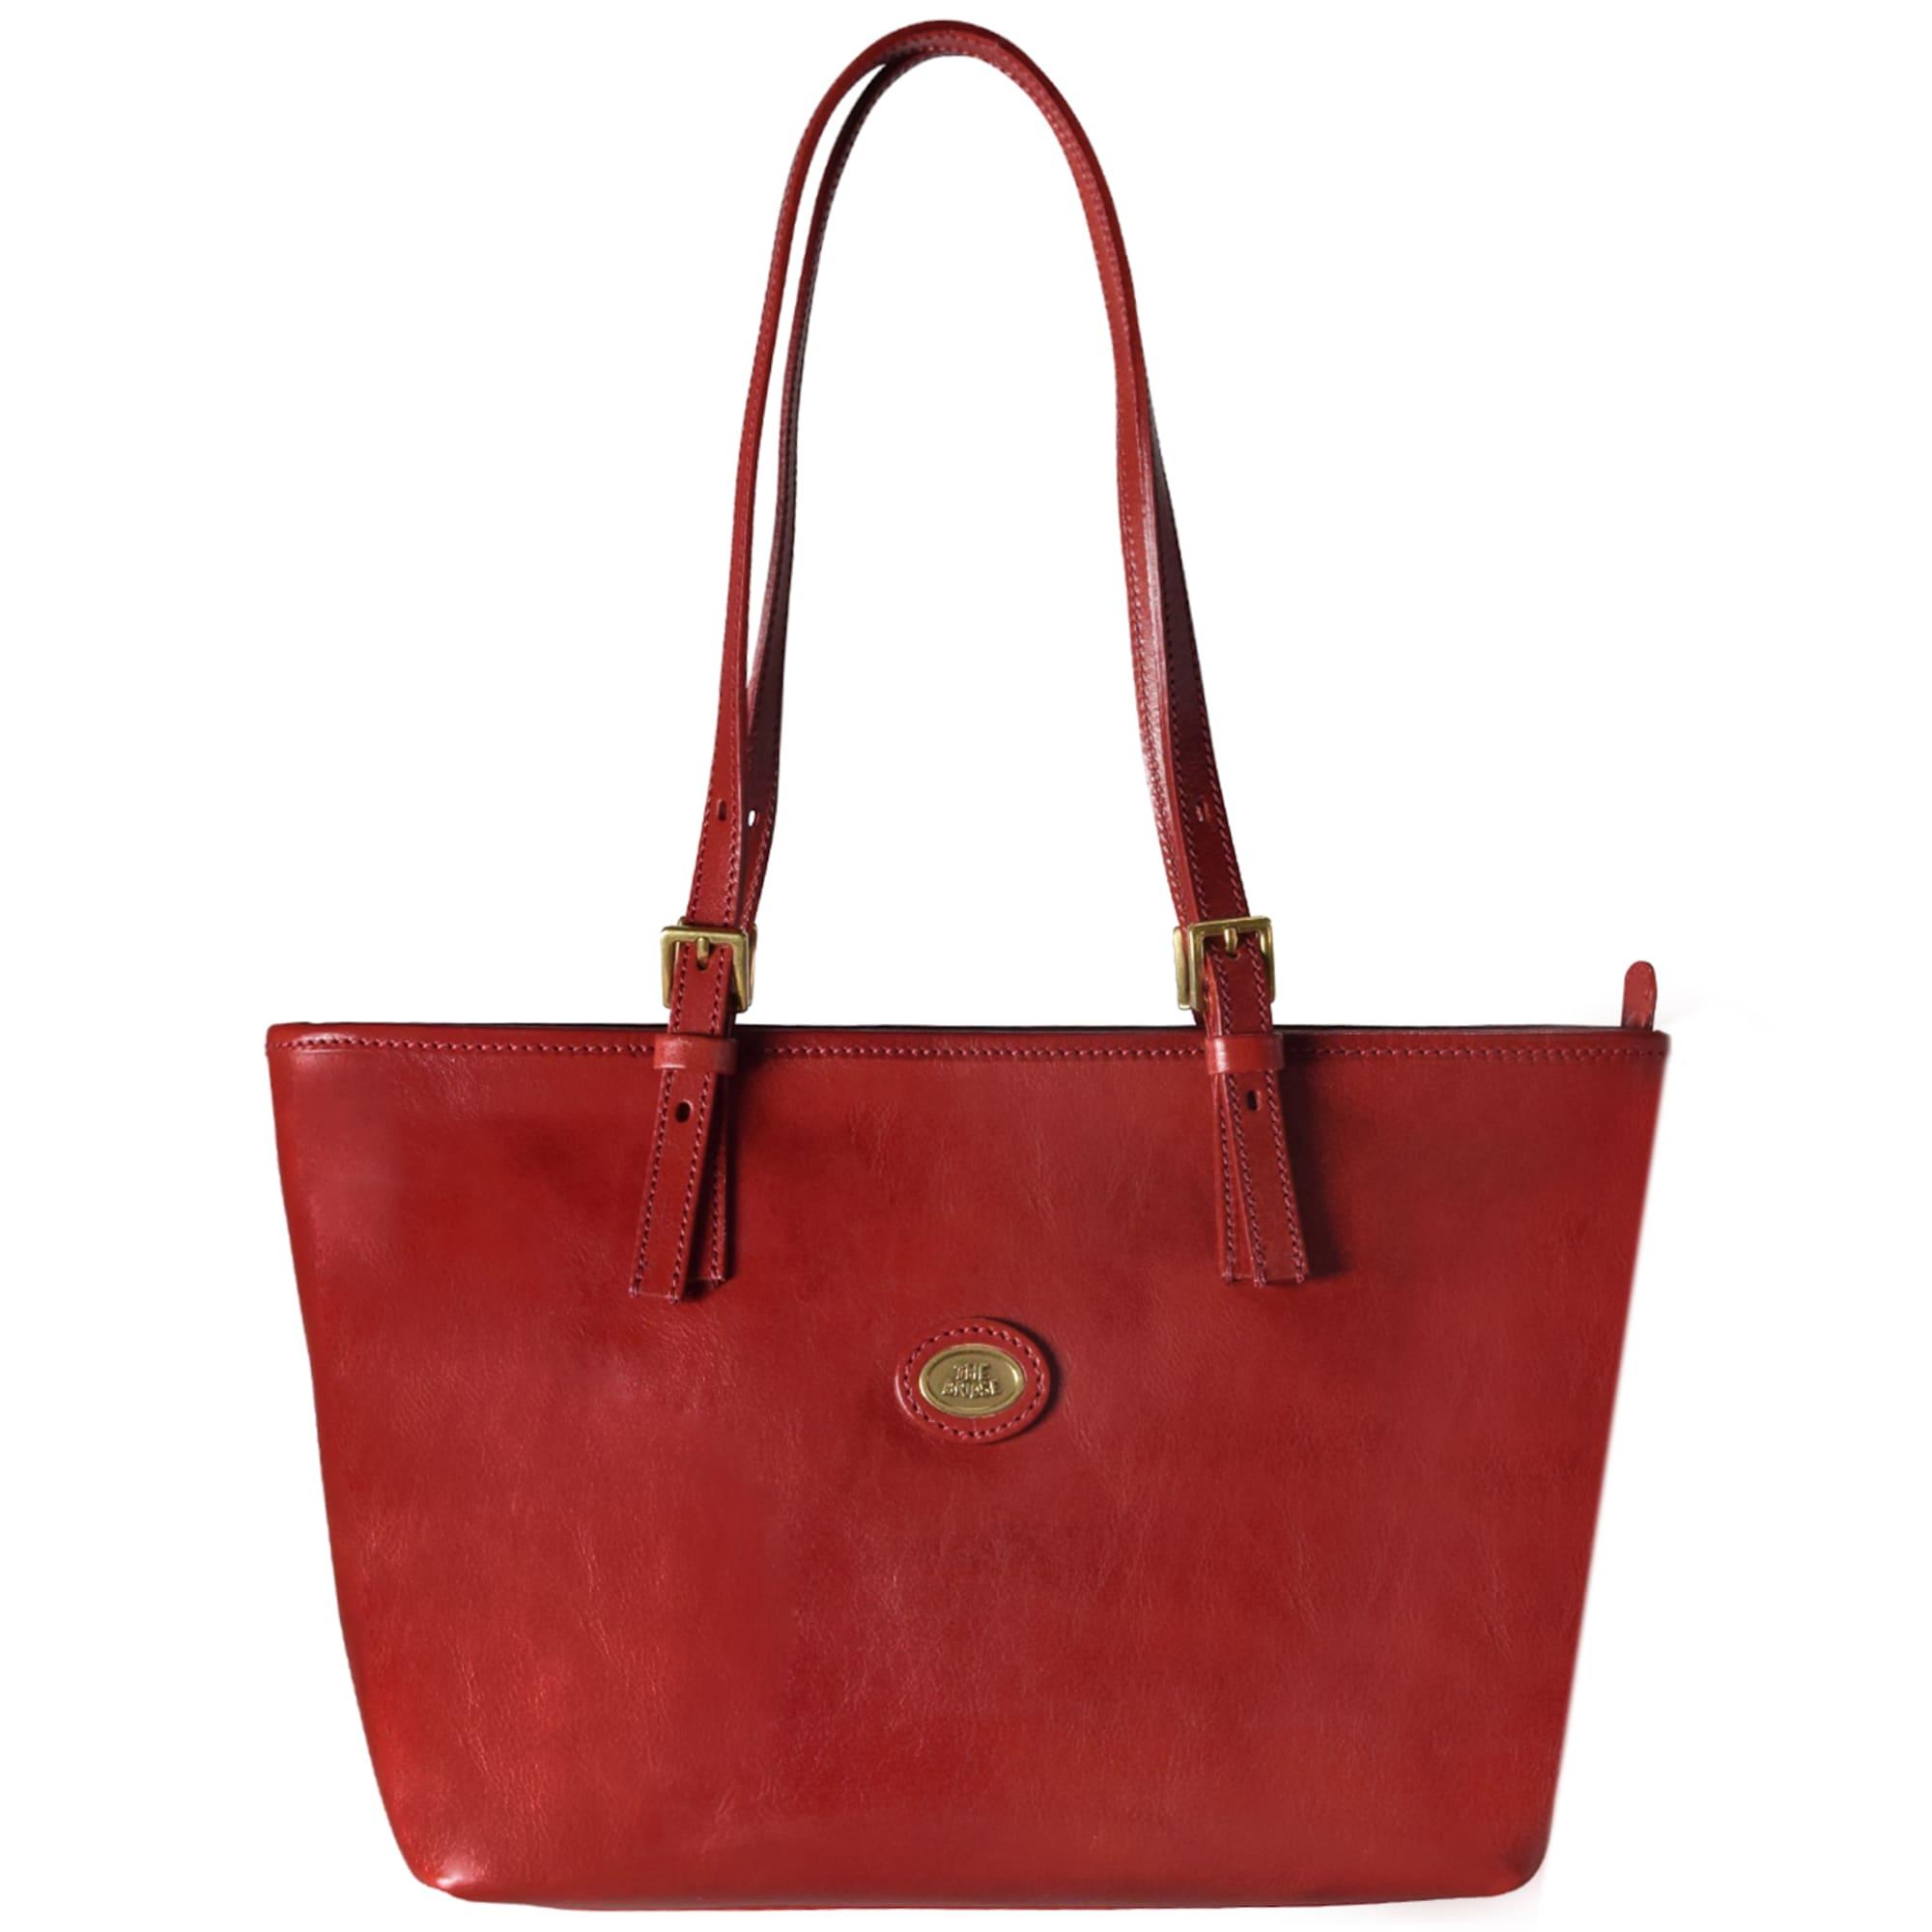 Story Donna Shopper Tasche Leder 30 cm | Taschen > Handtaschen > Shopper | The Bridge